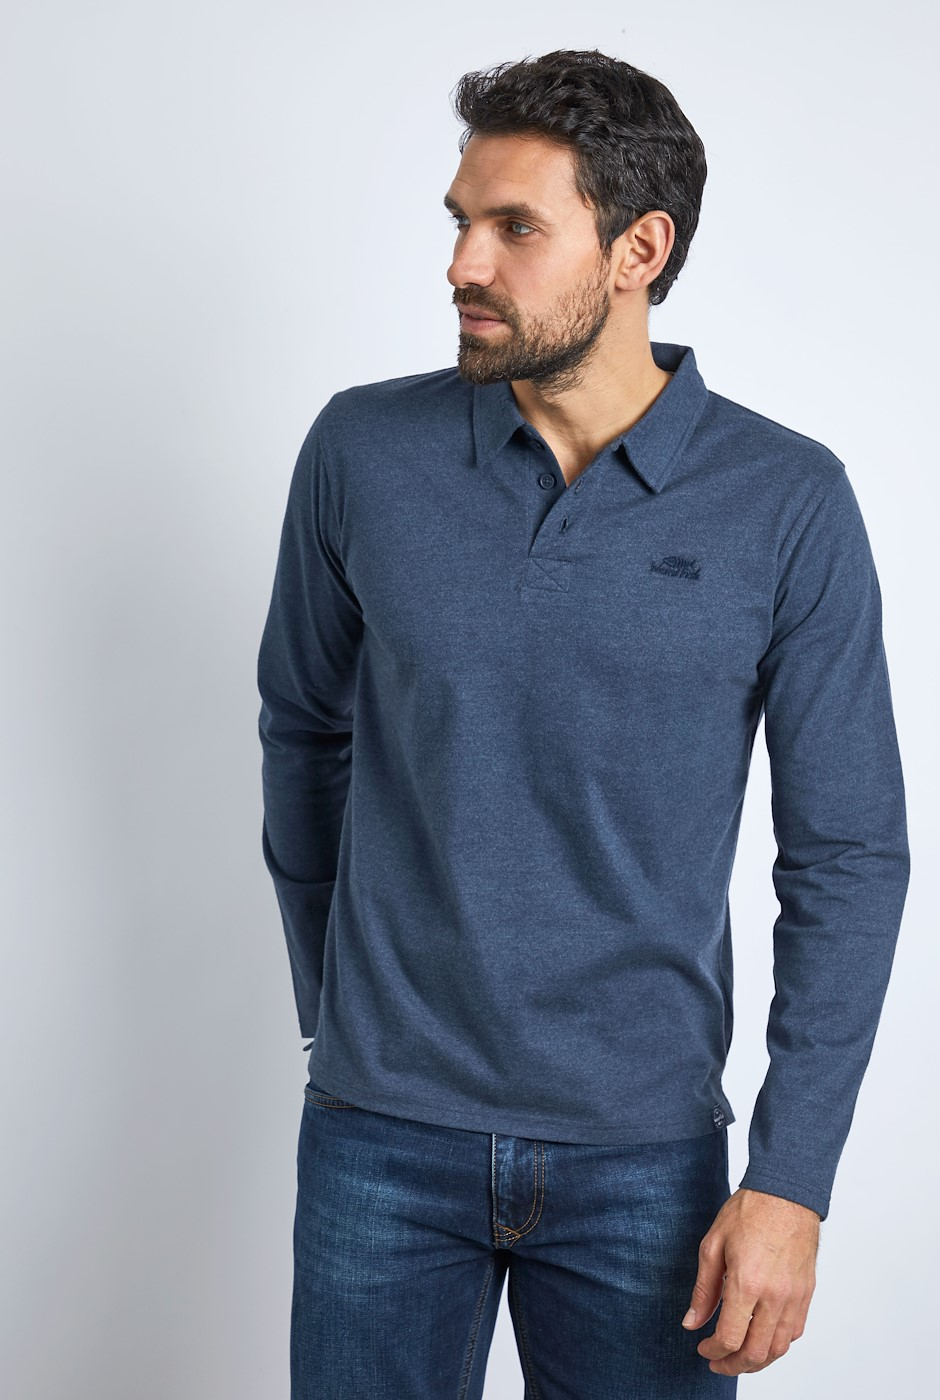 Jasper Eco Long Sleeve Branded Polo Navy